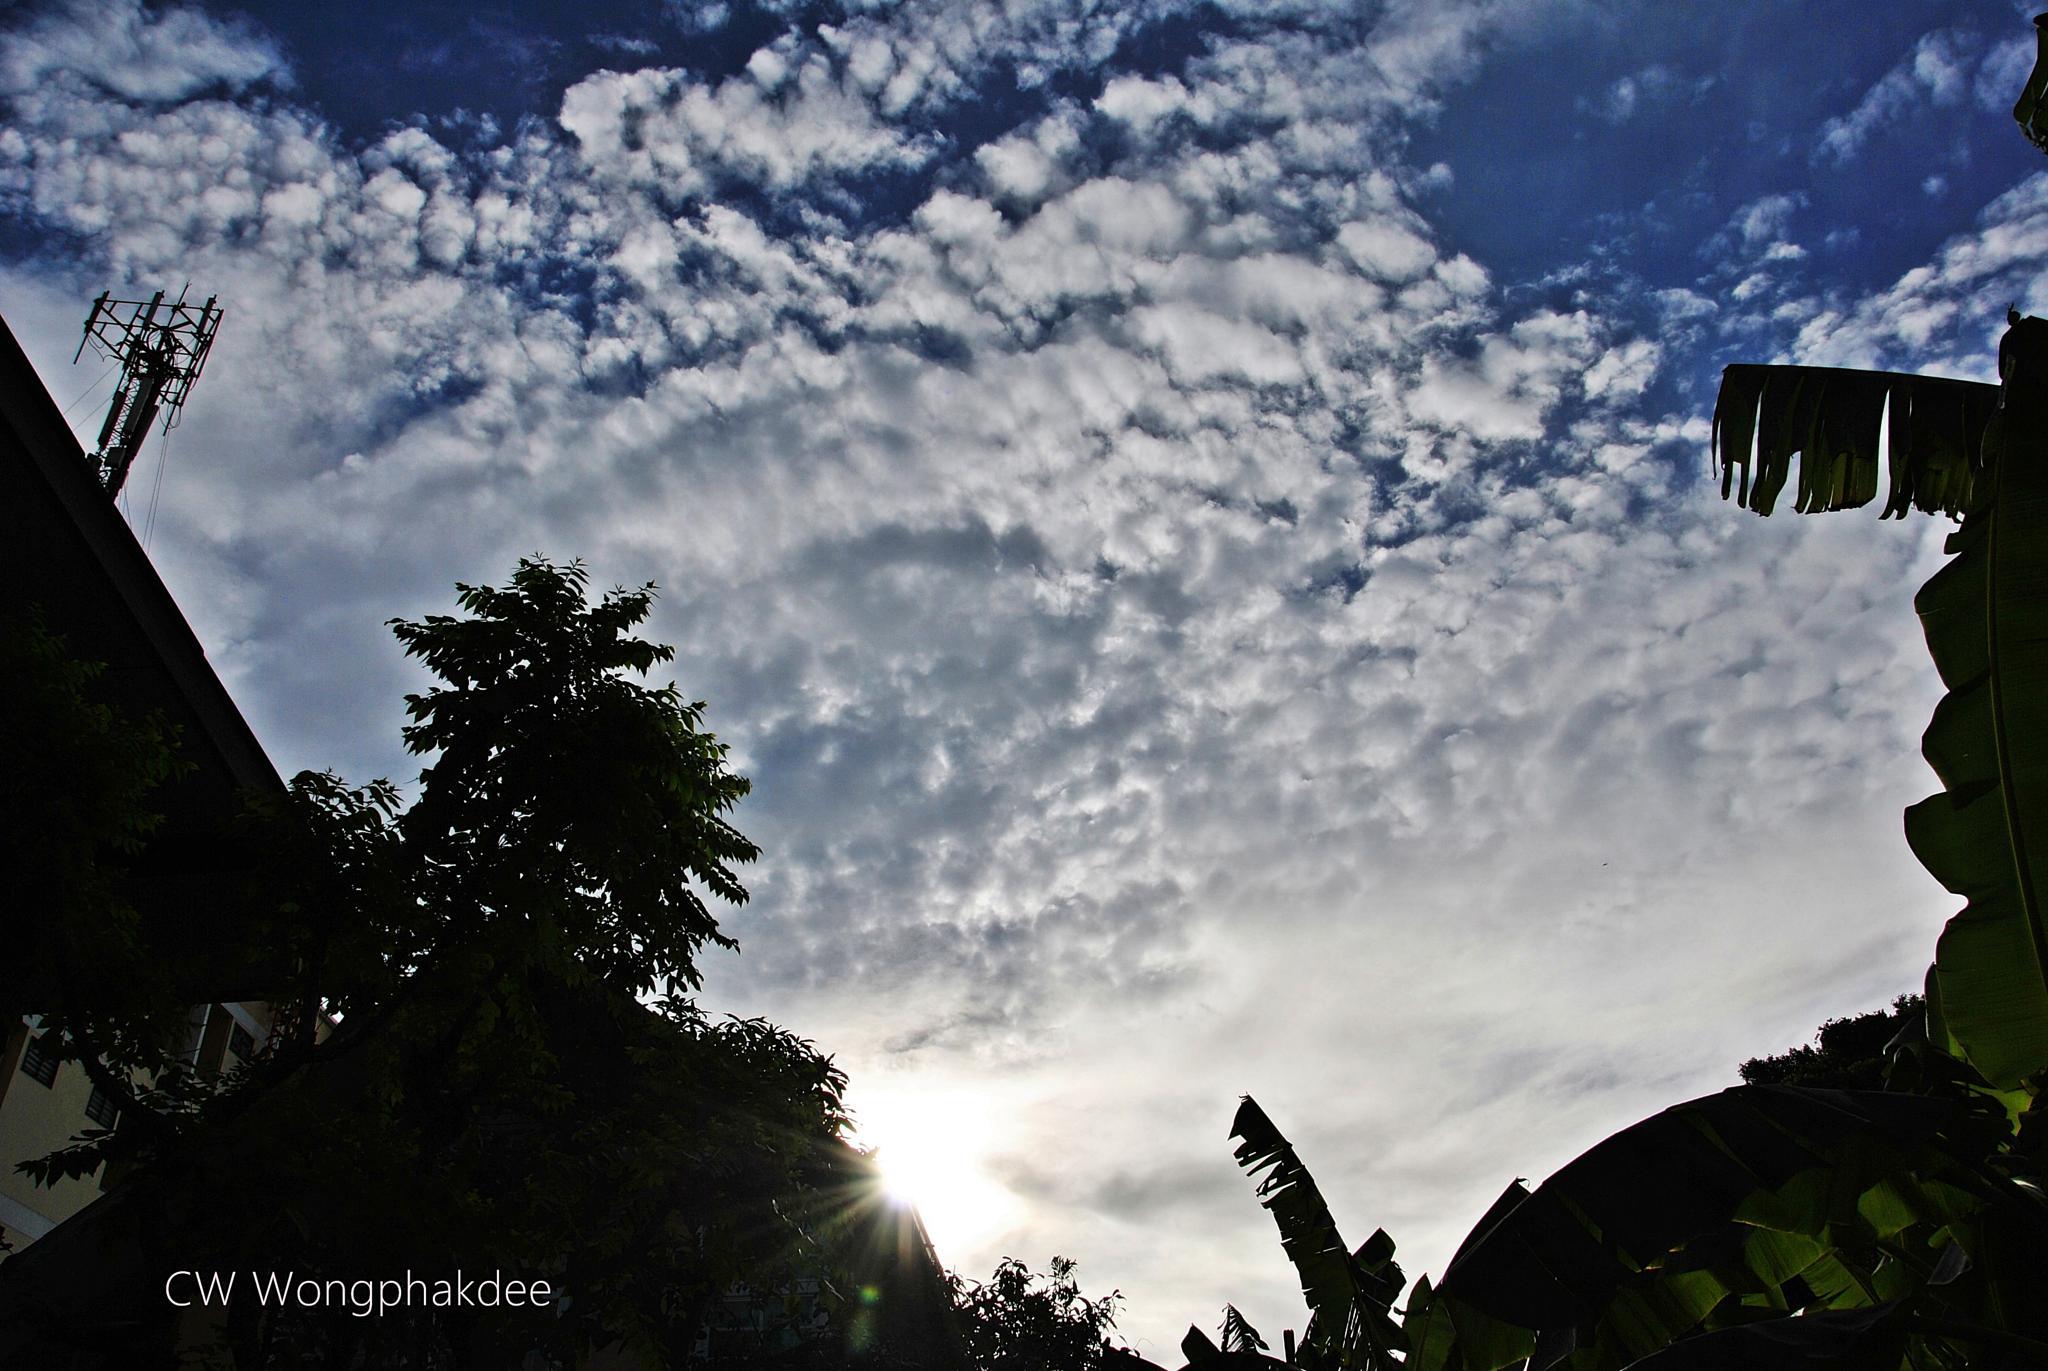 Morning by Wongphakdee